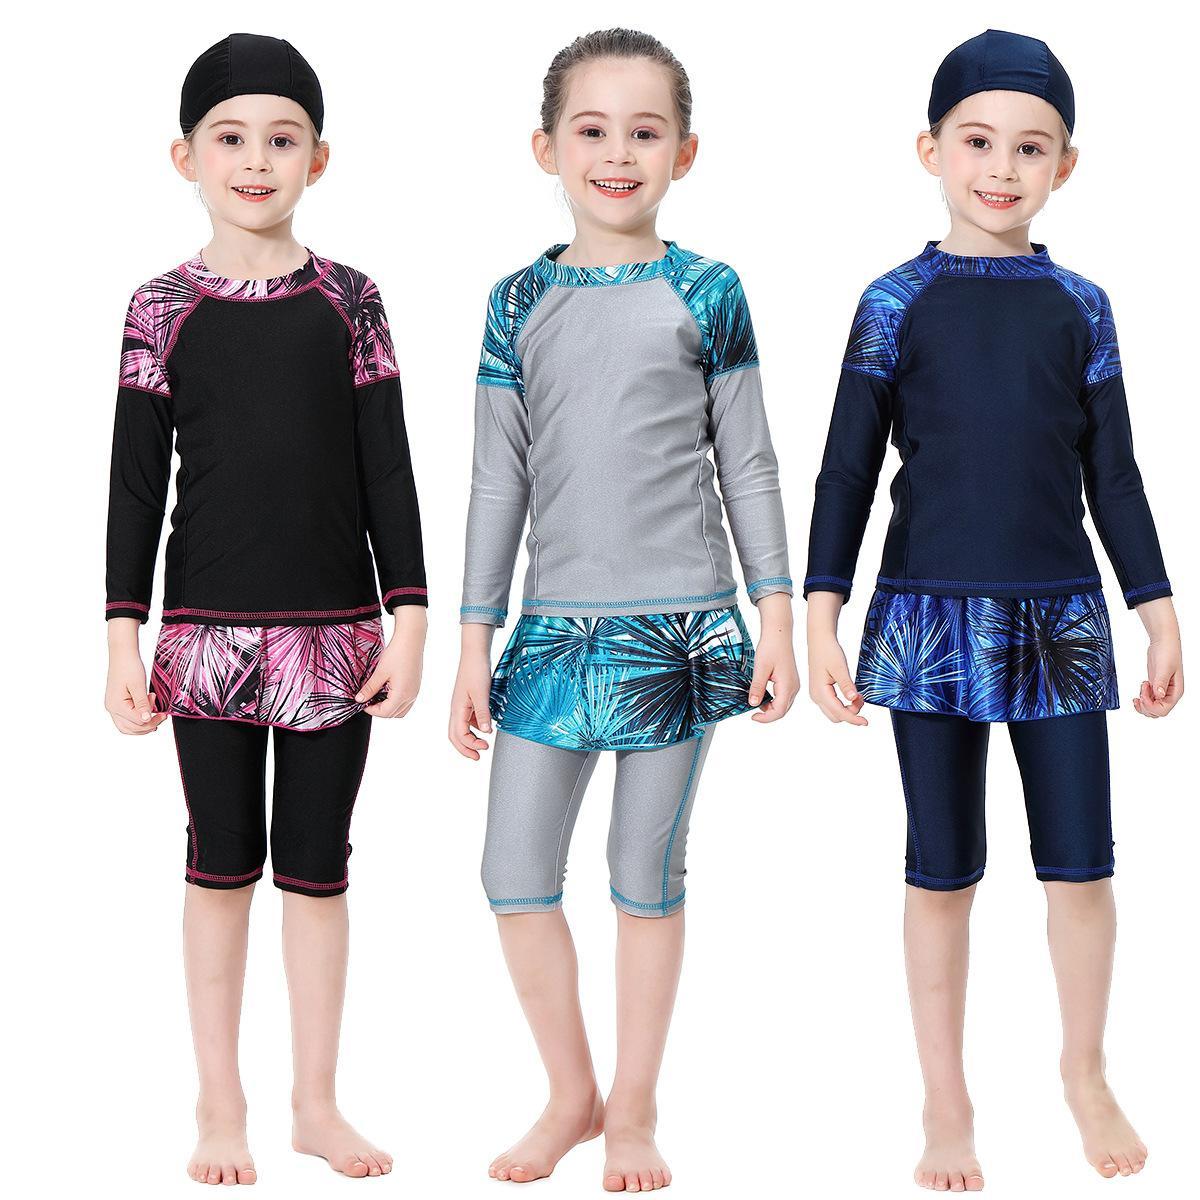 Muslim Swimwear Girls Kids Full Cover Swimsuit Islamic Modest Beachwear Burkini